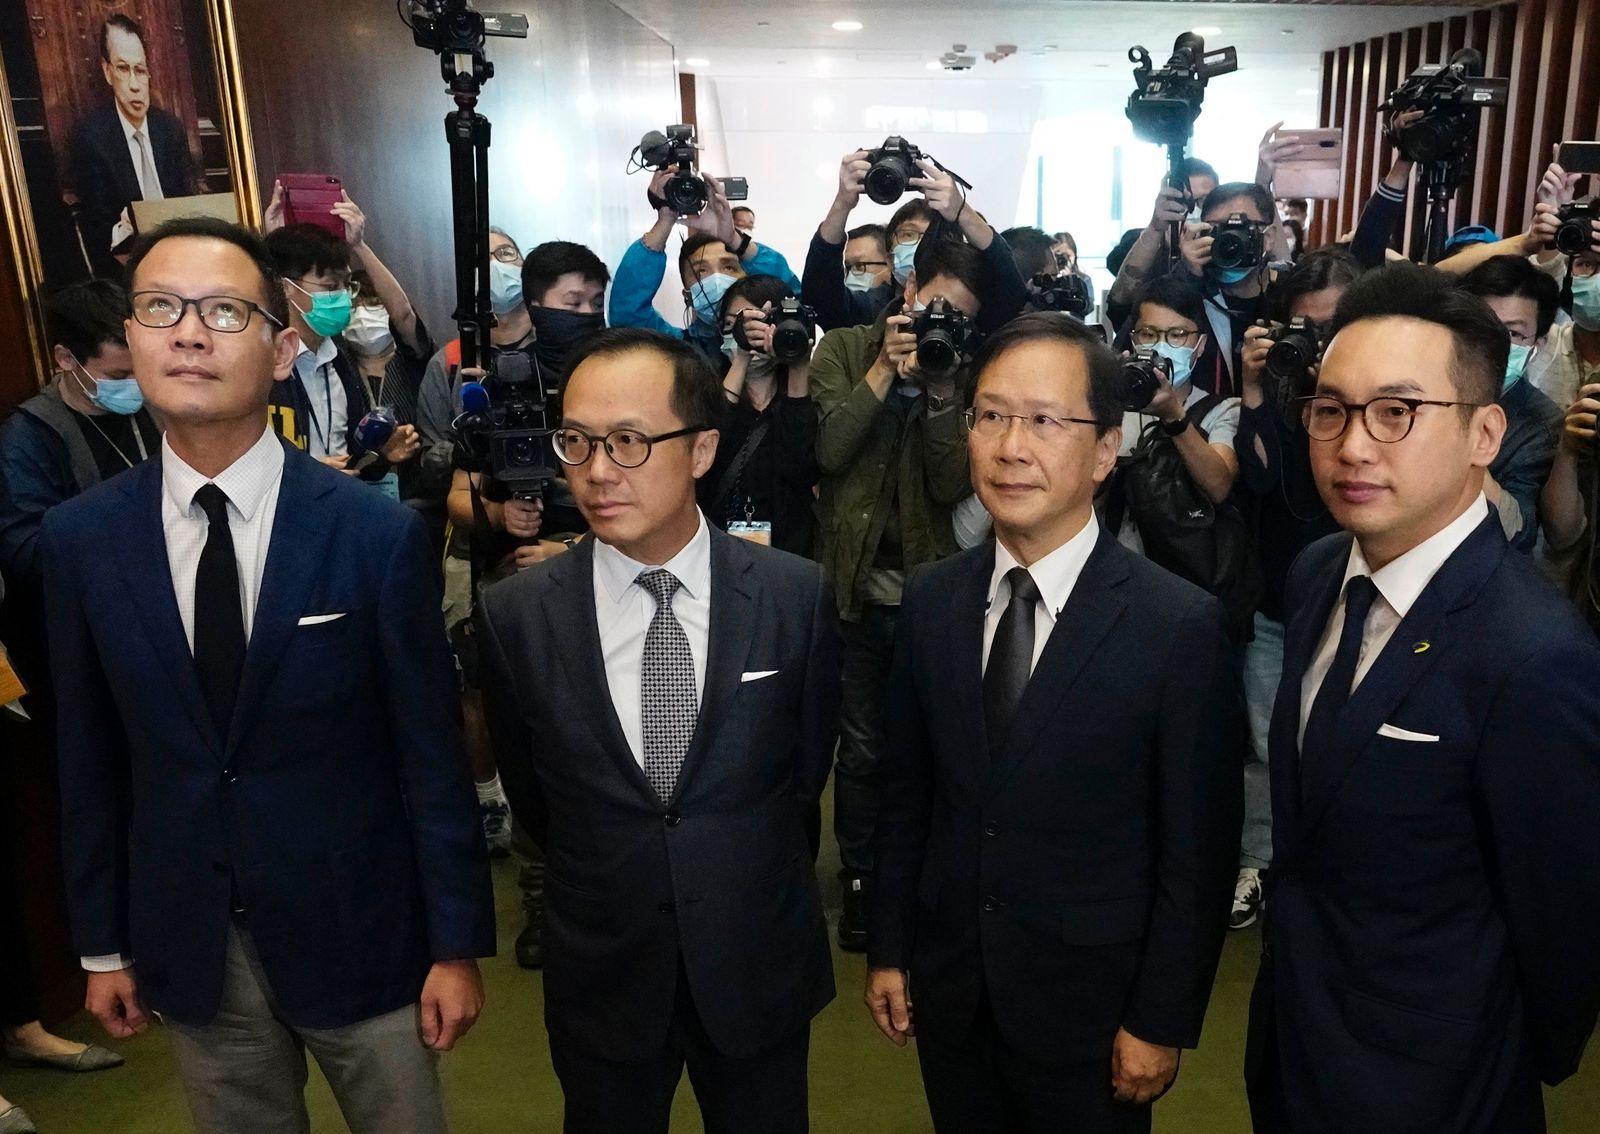 Carrie Lam, Dennis Kwok, Kenneth Leung, Kwok Ka-ki, Alvin Yeung